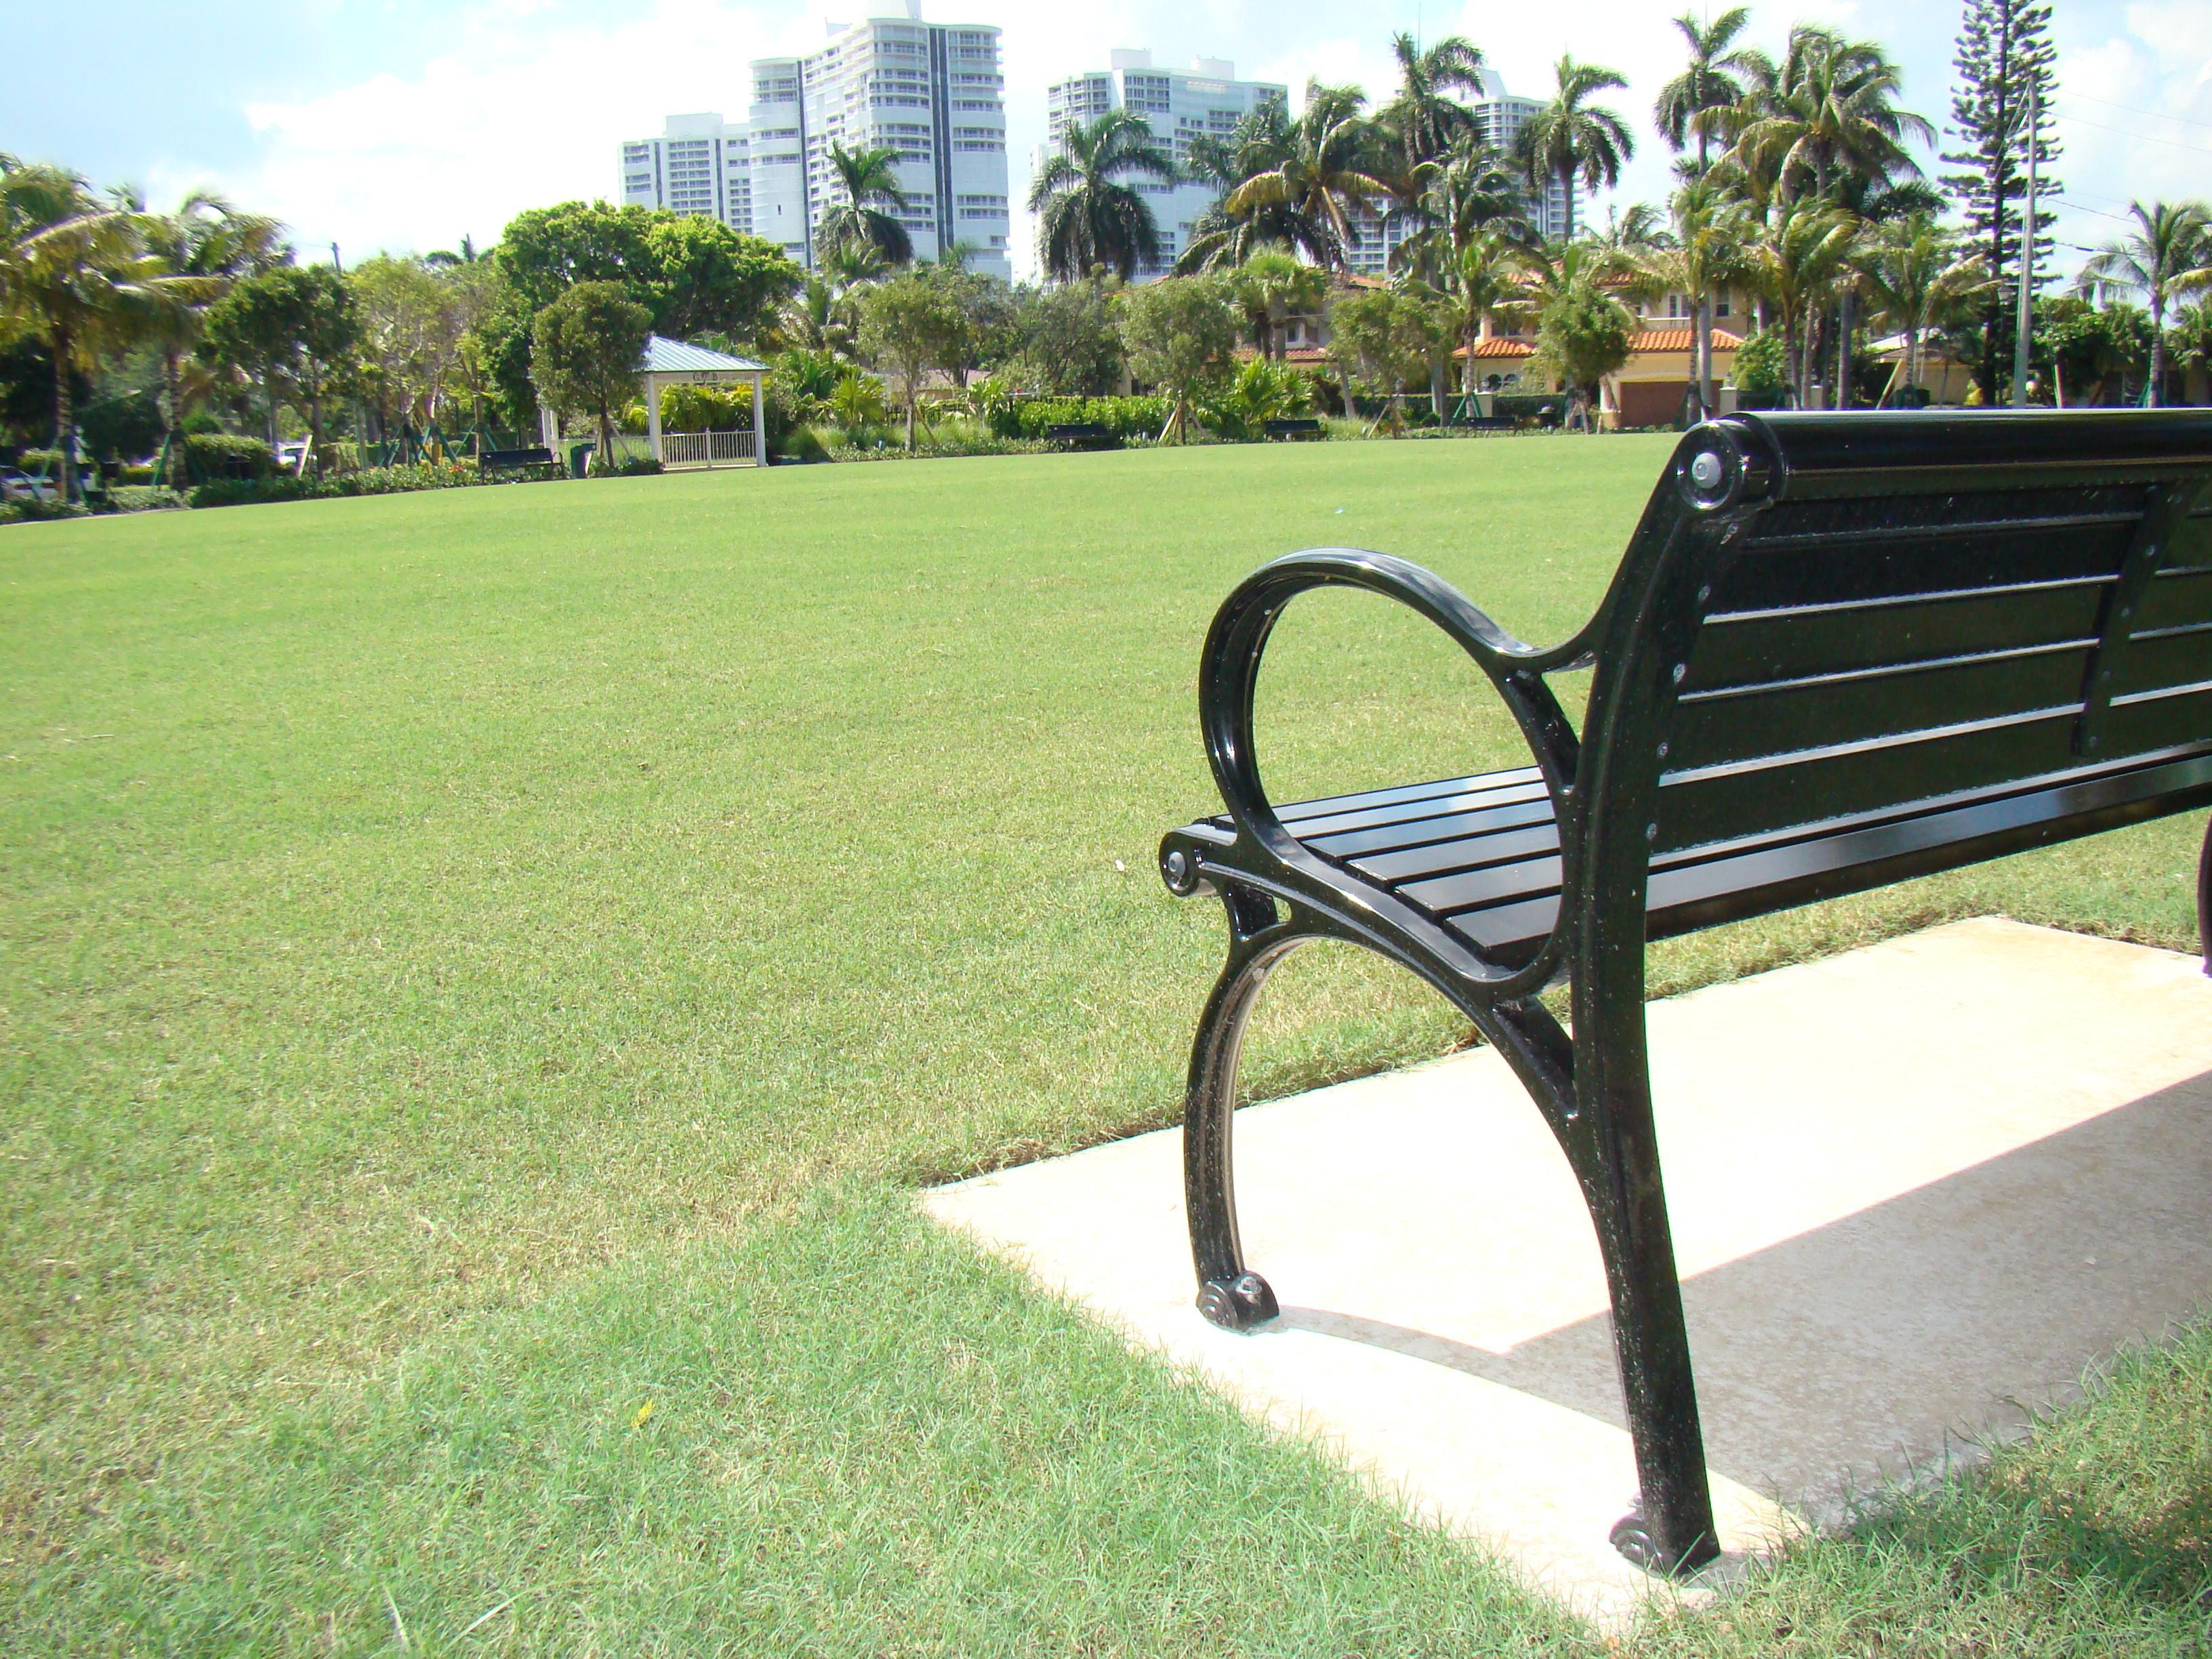 Recreation – The Town of Golden Beach